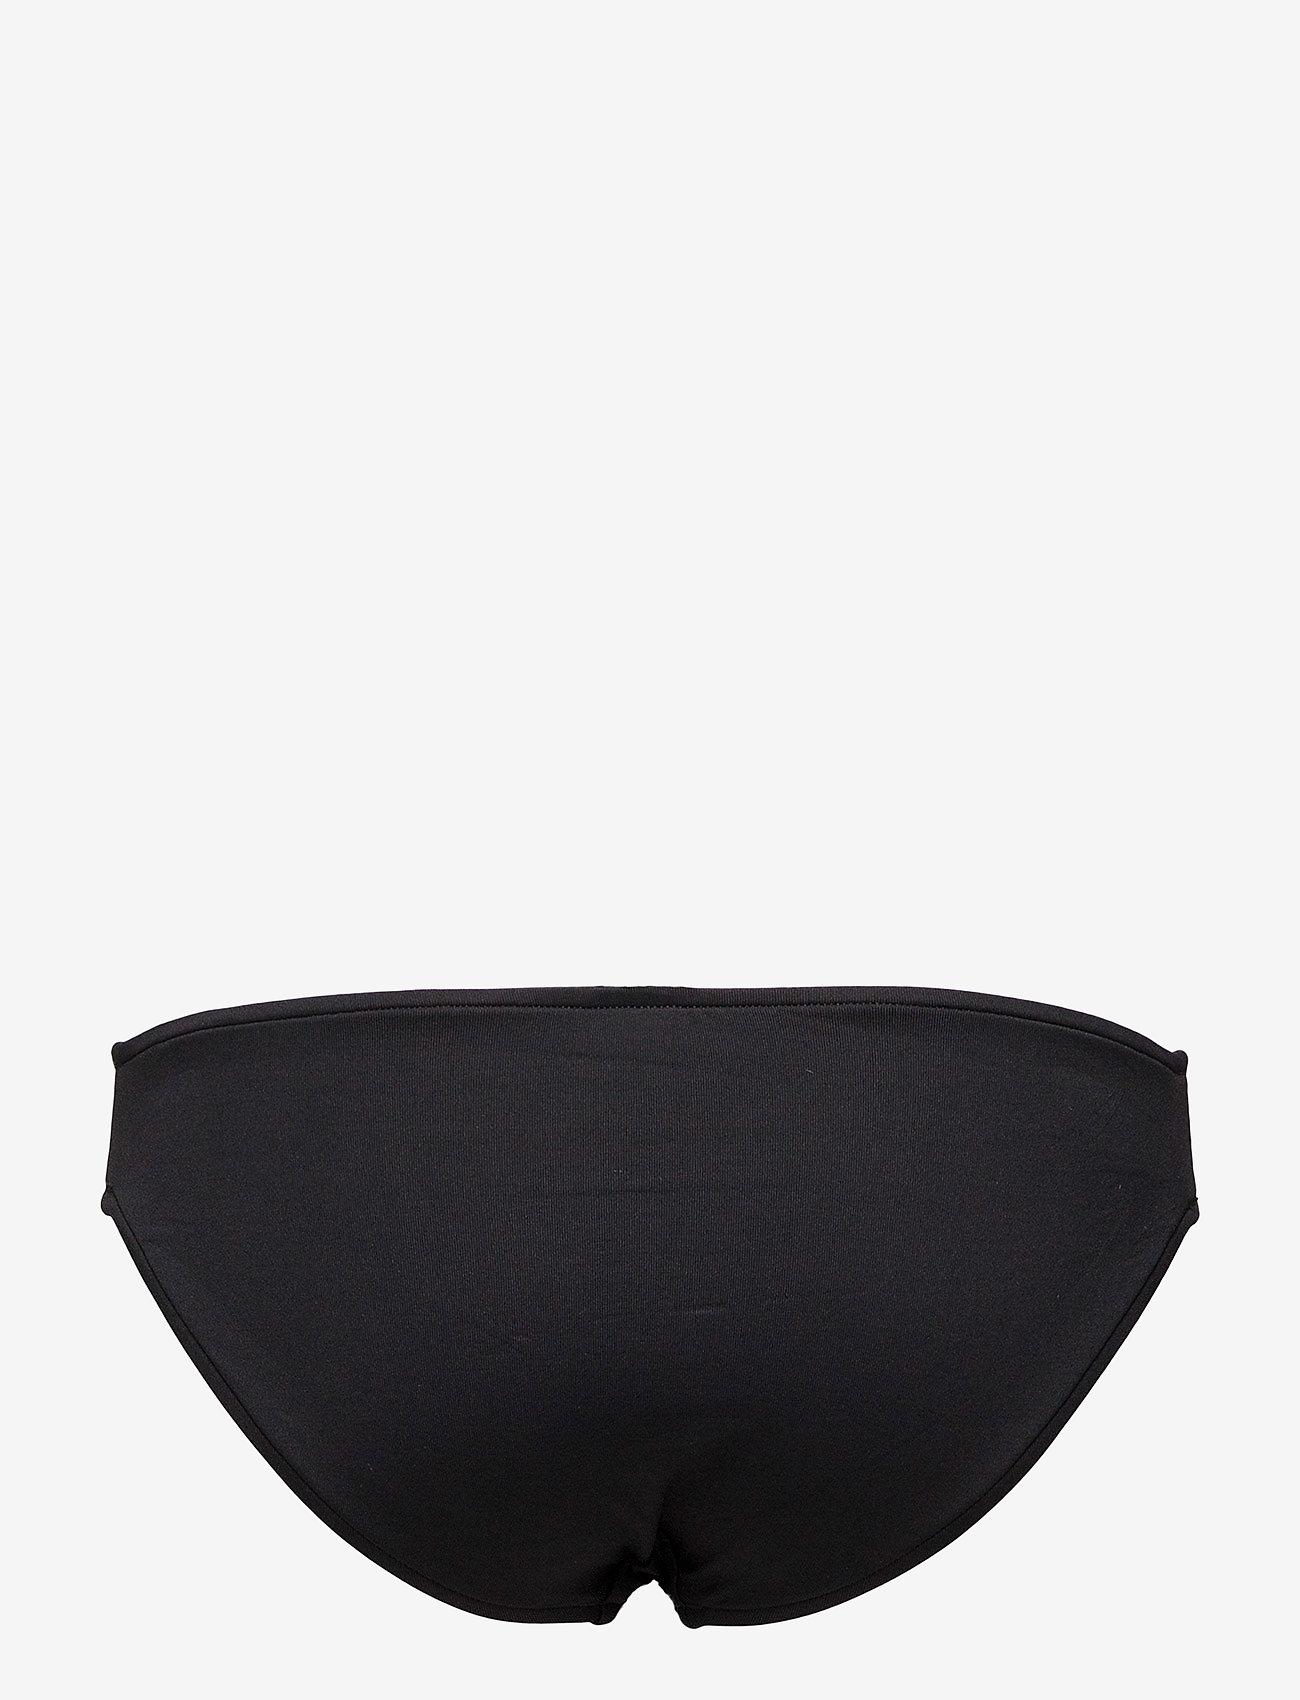 Seafolly - Quilted Hipster - bikinialaosat - black